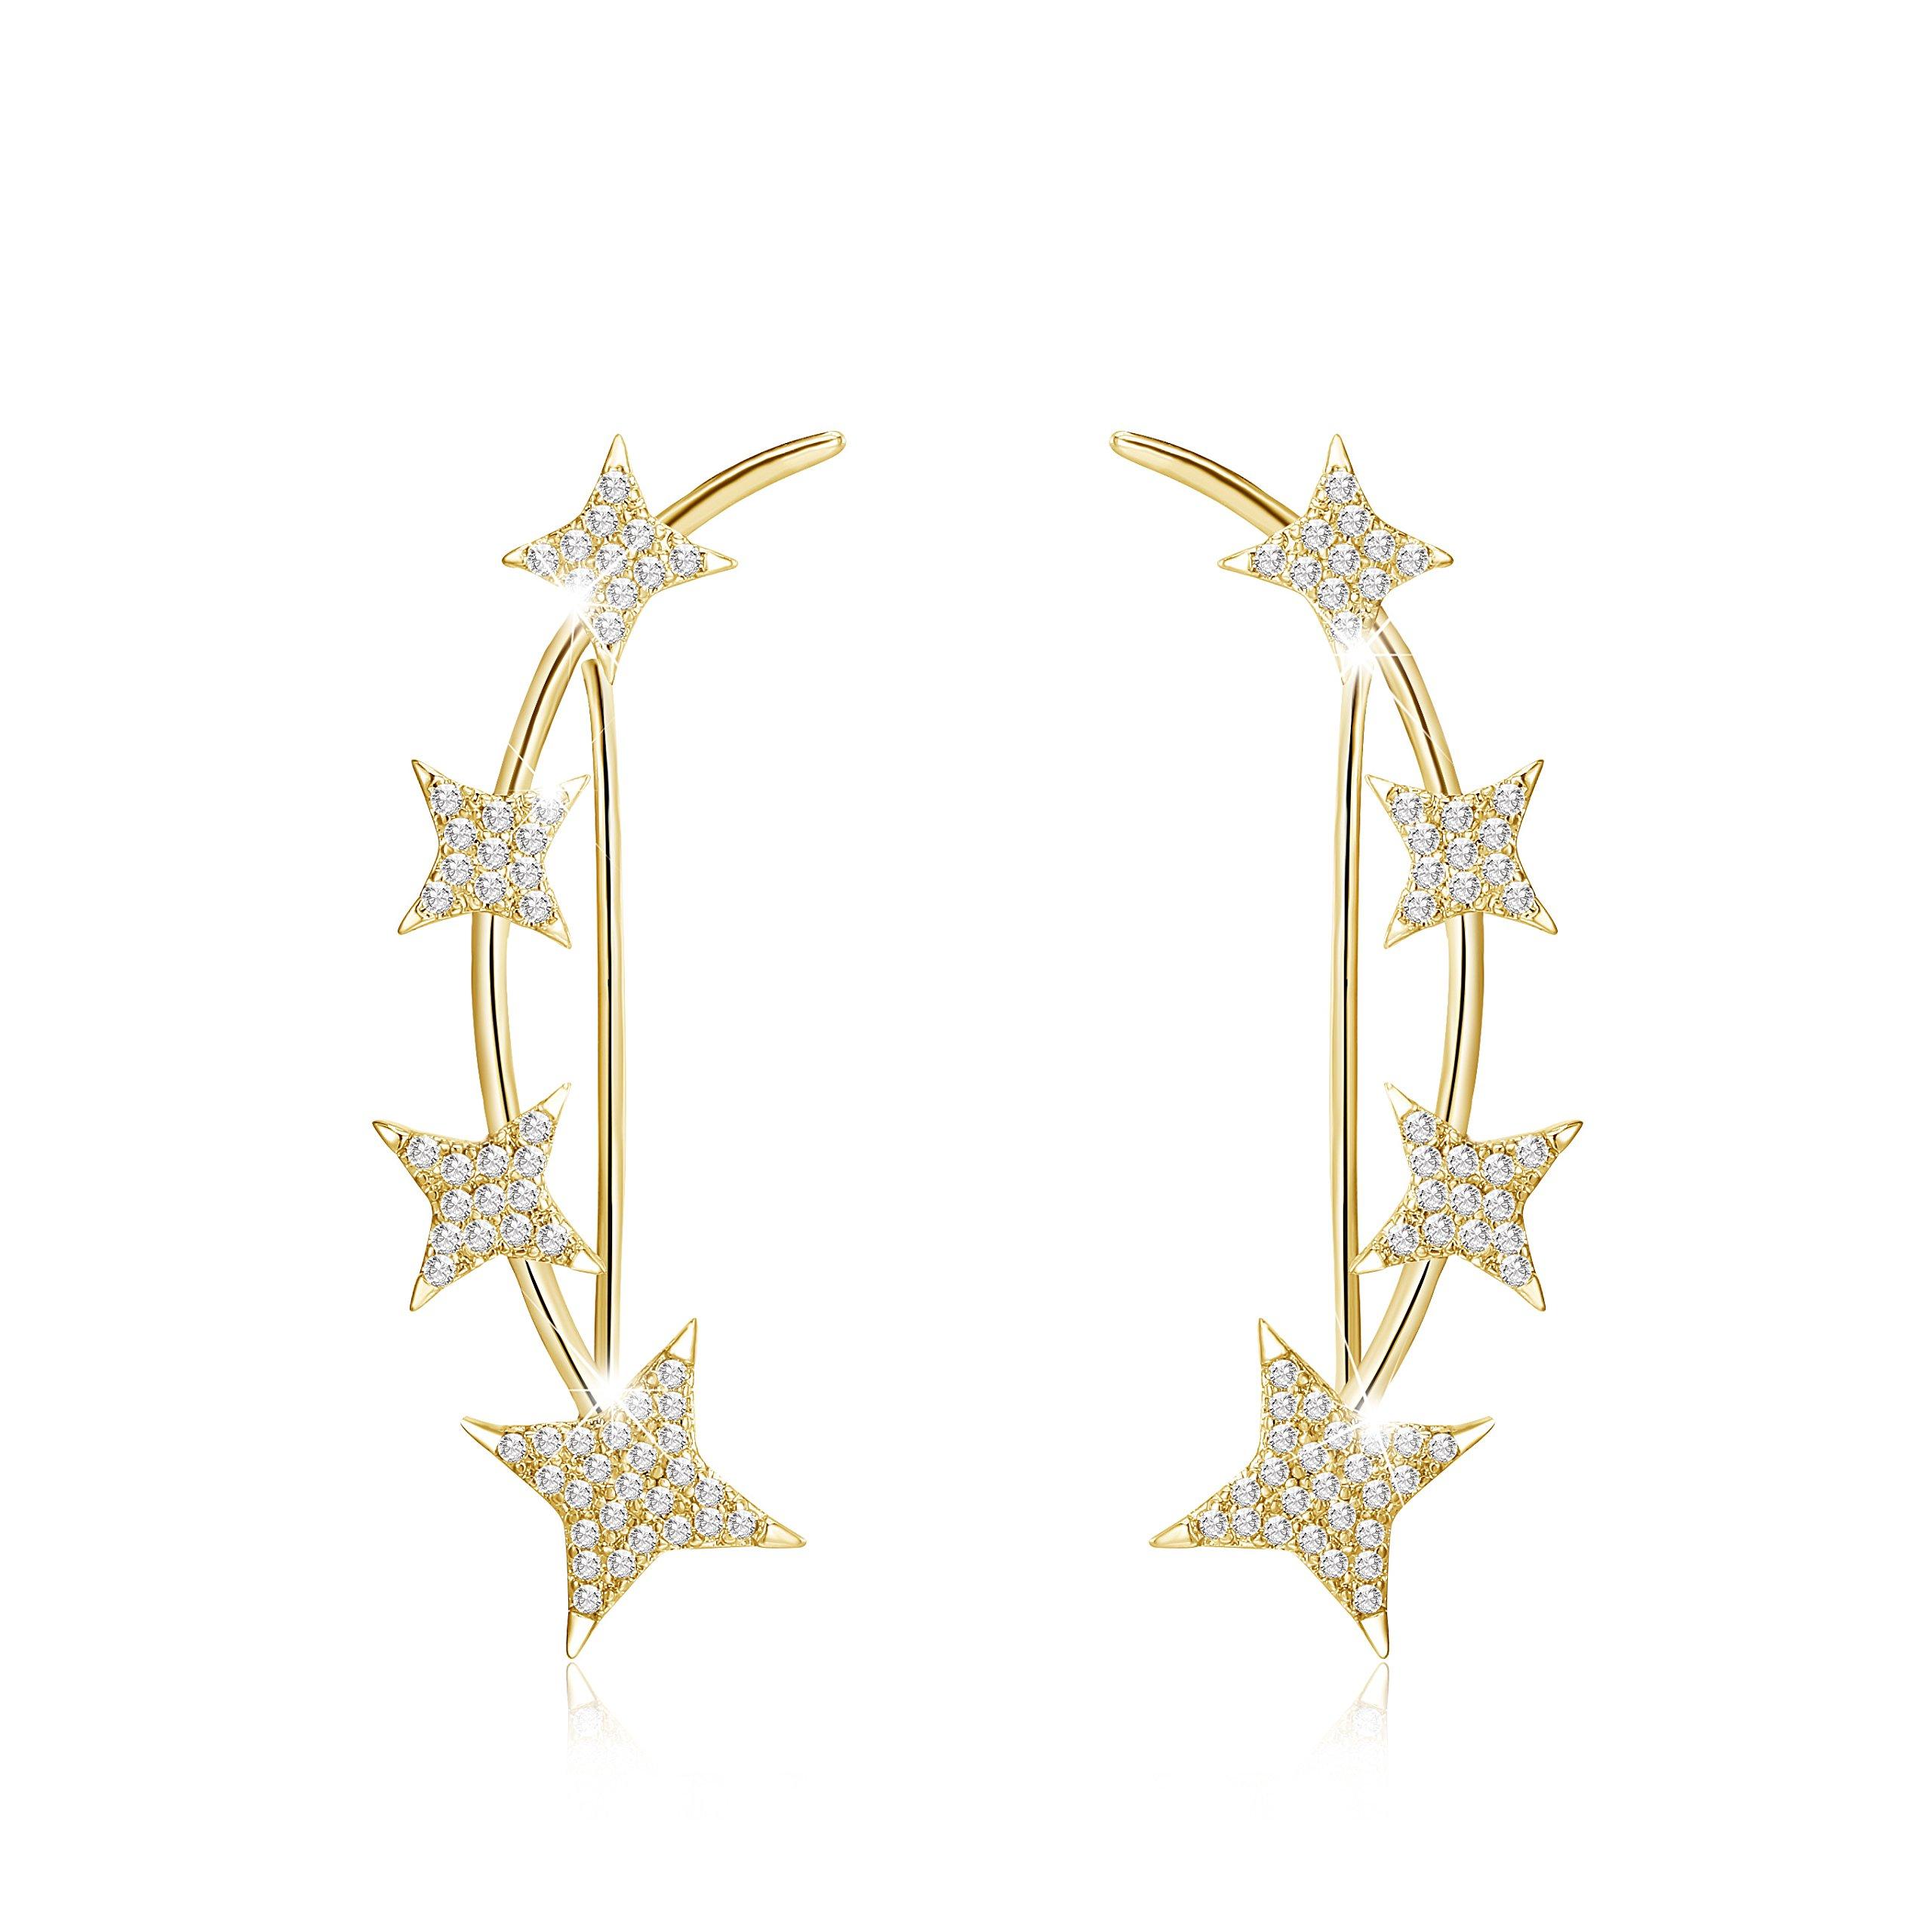 Mevecco Womens Girls Ear Crawler Climber CZ Crystal Star Ear Wrap Cuffs Earrings Sweep Stud Earring Pin Jewelry-Star-Gold